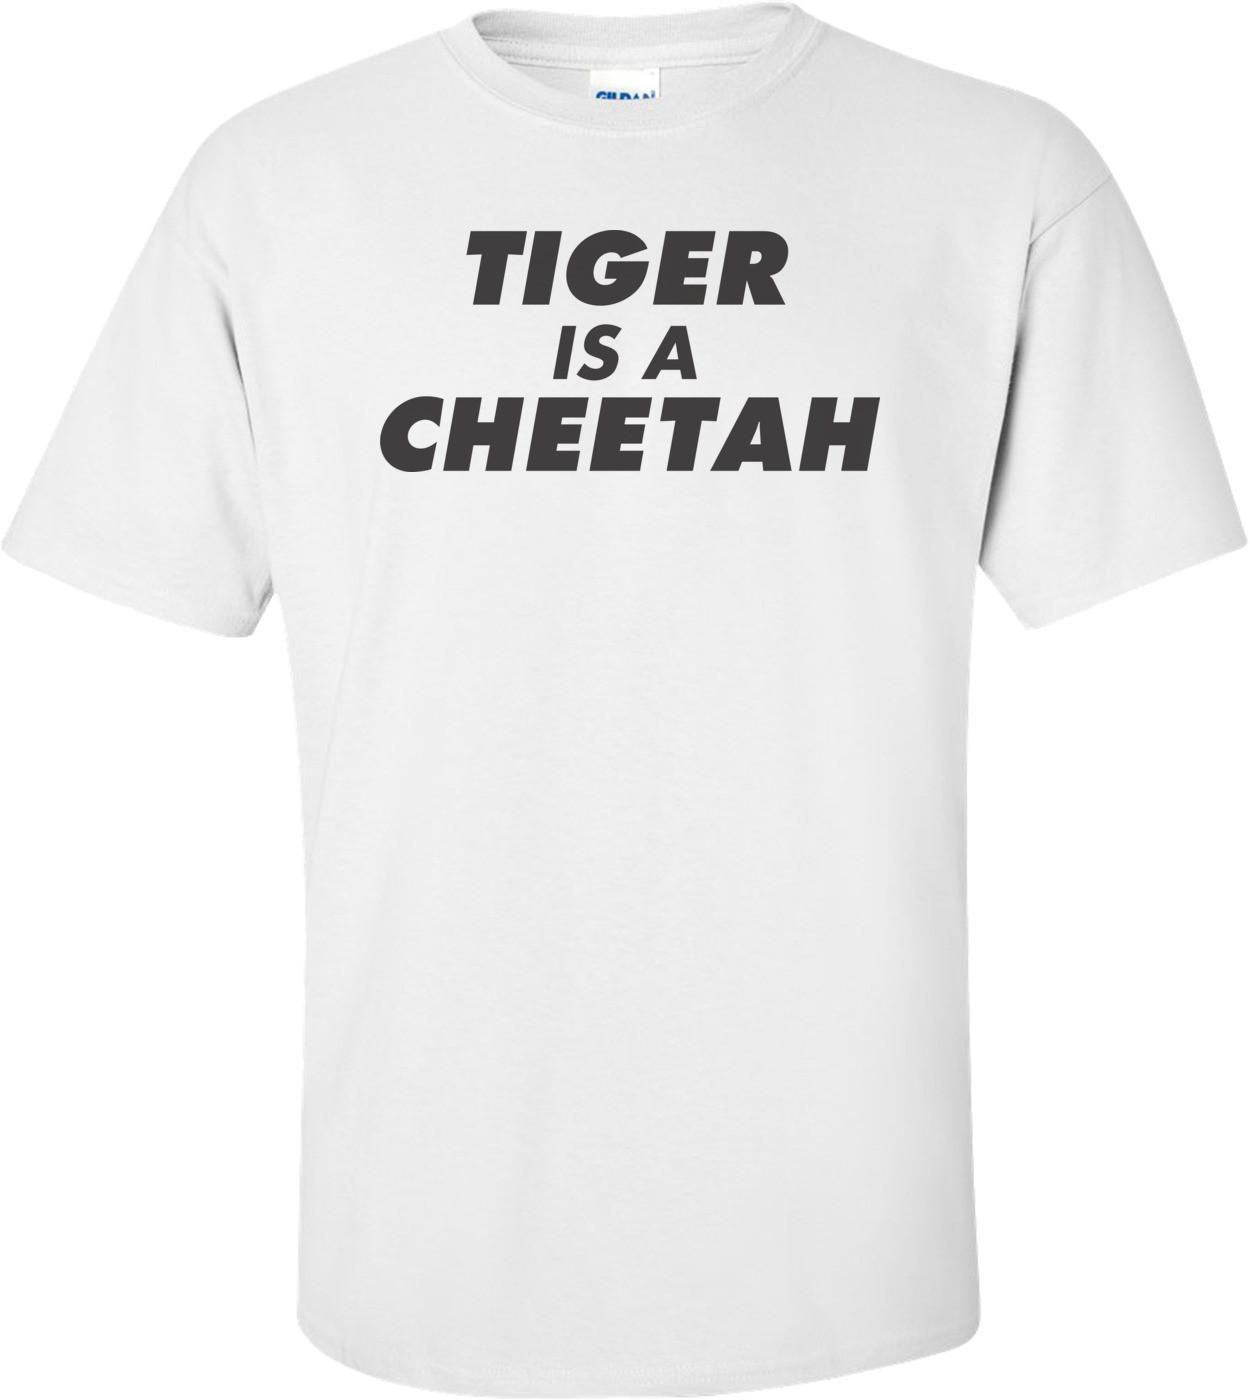 Tiger Is A Cheetah T-shirt